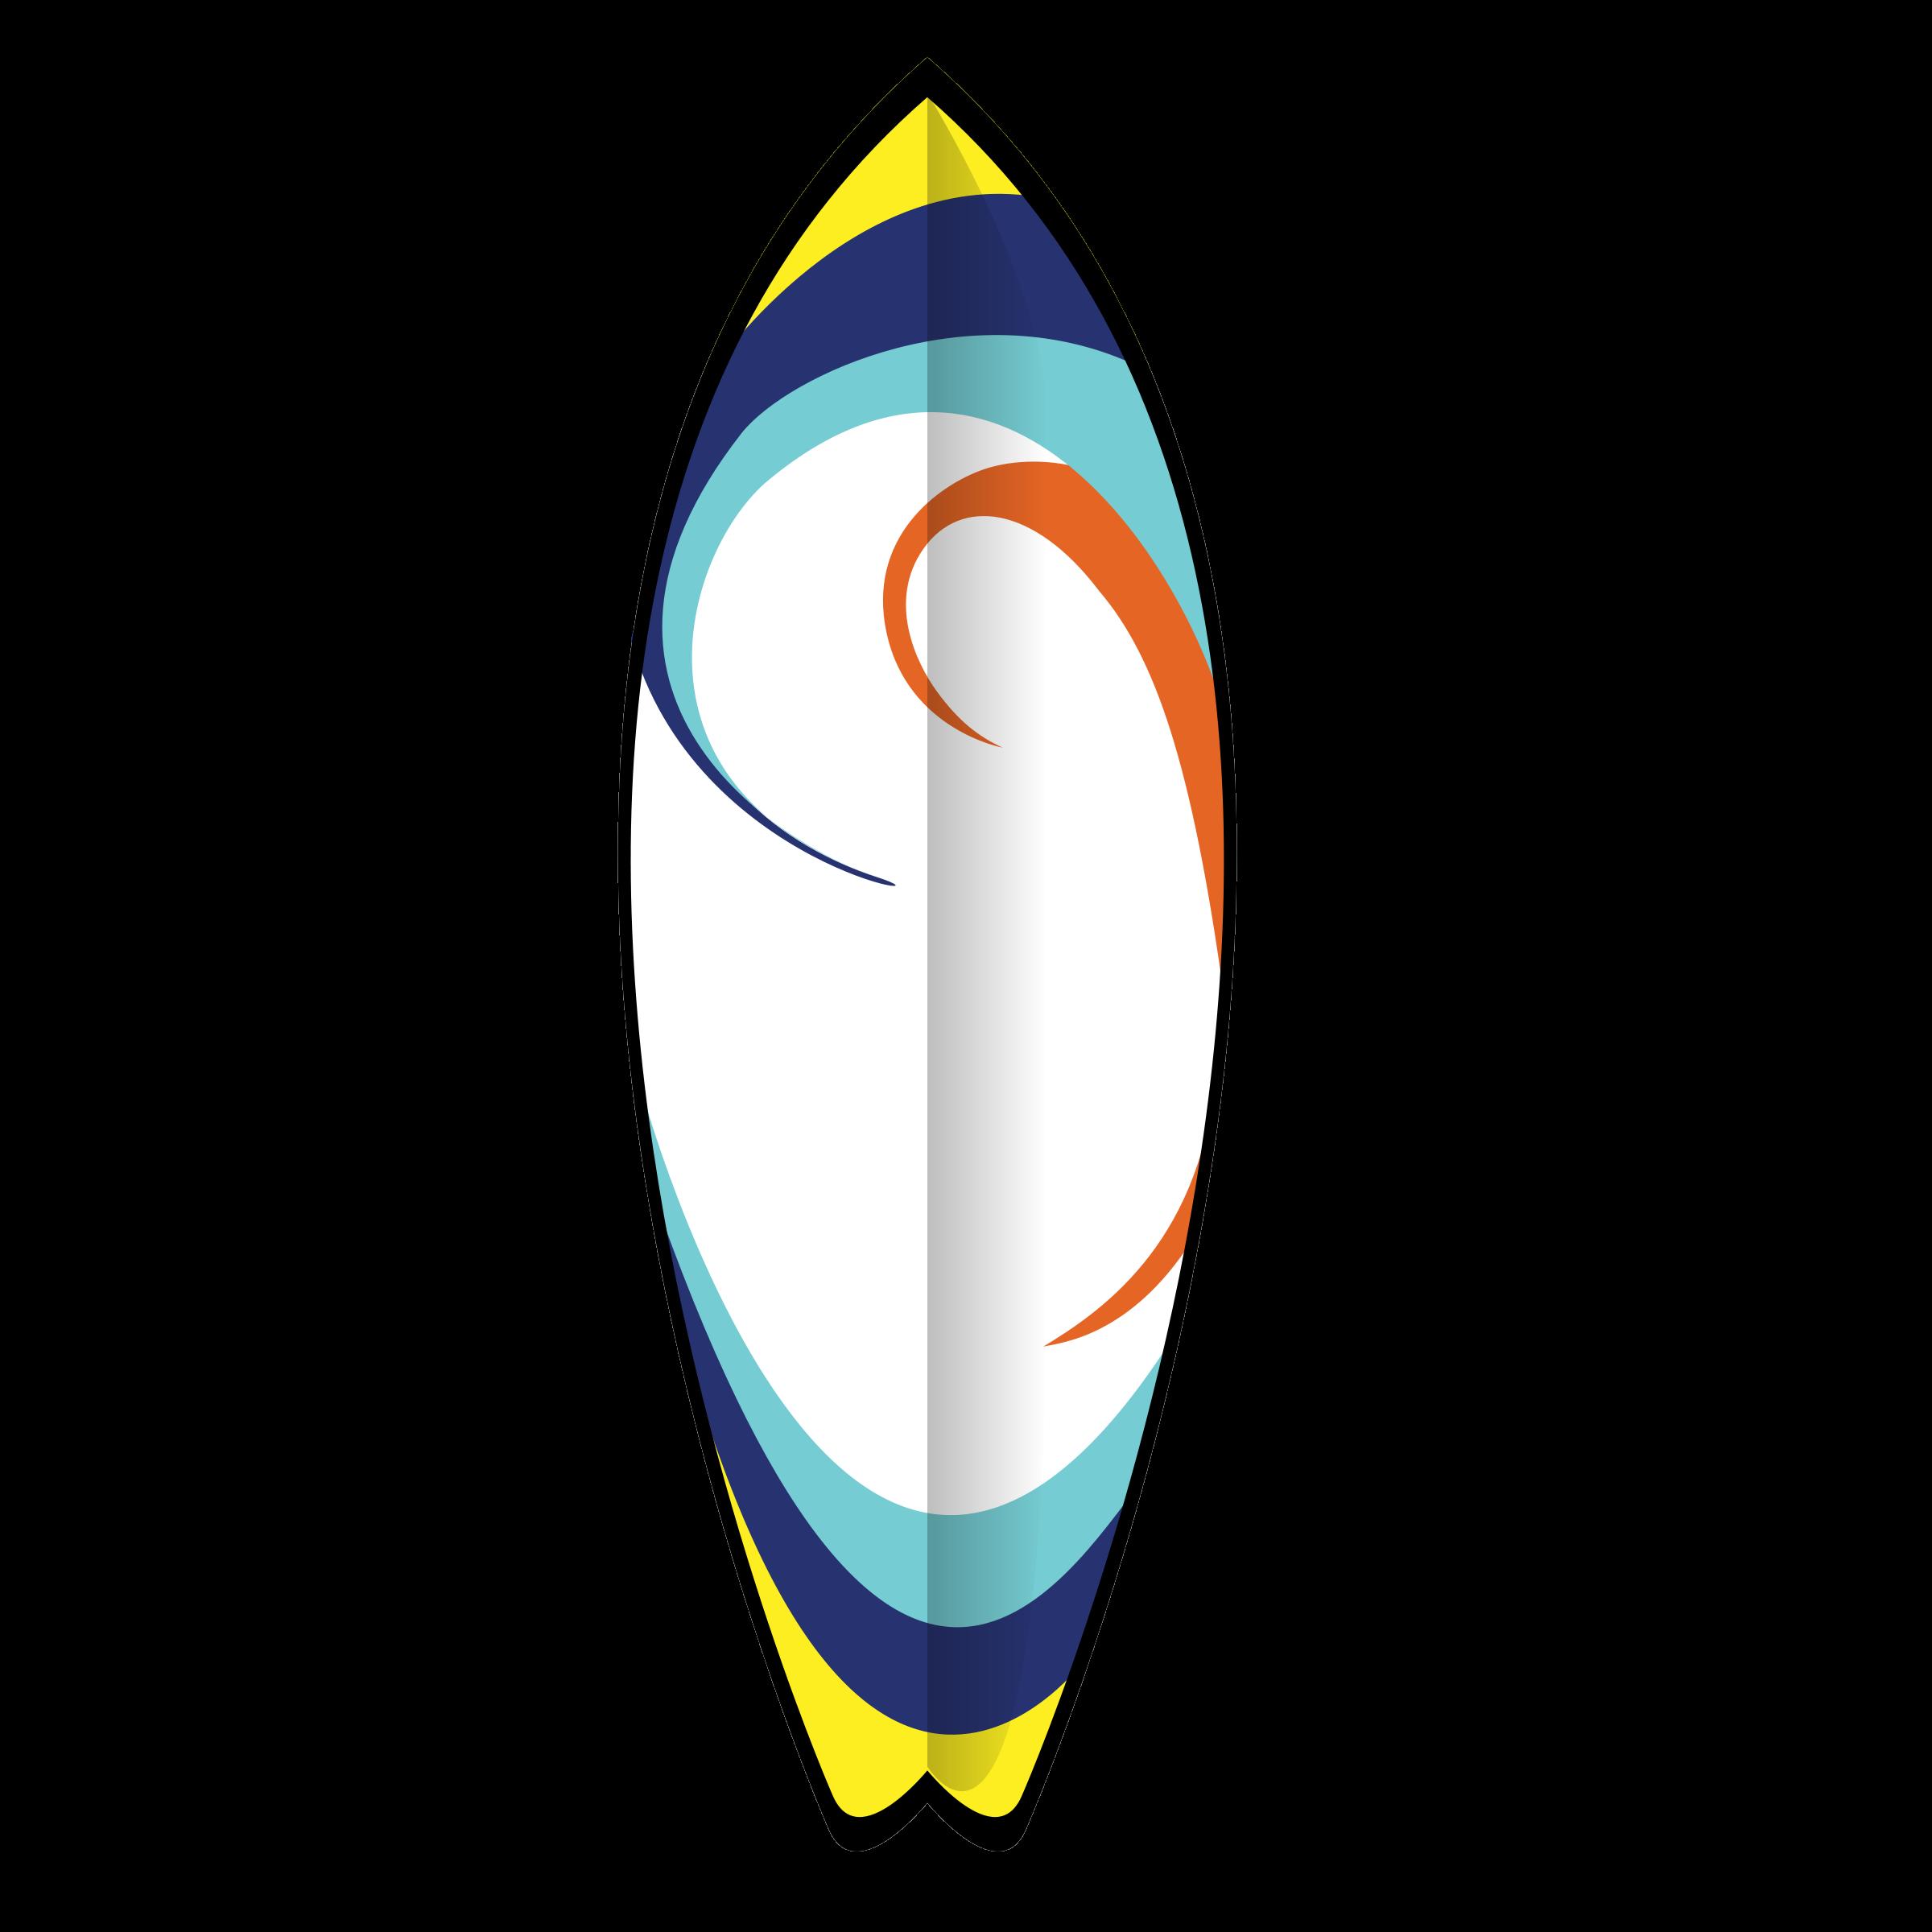 surfboard clip art free clipart panda free clipart images rh clipartpanda com surfboard outline clip art surfboard images clip art